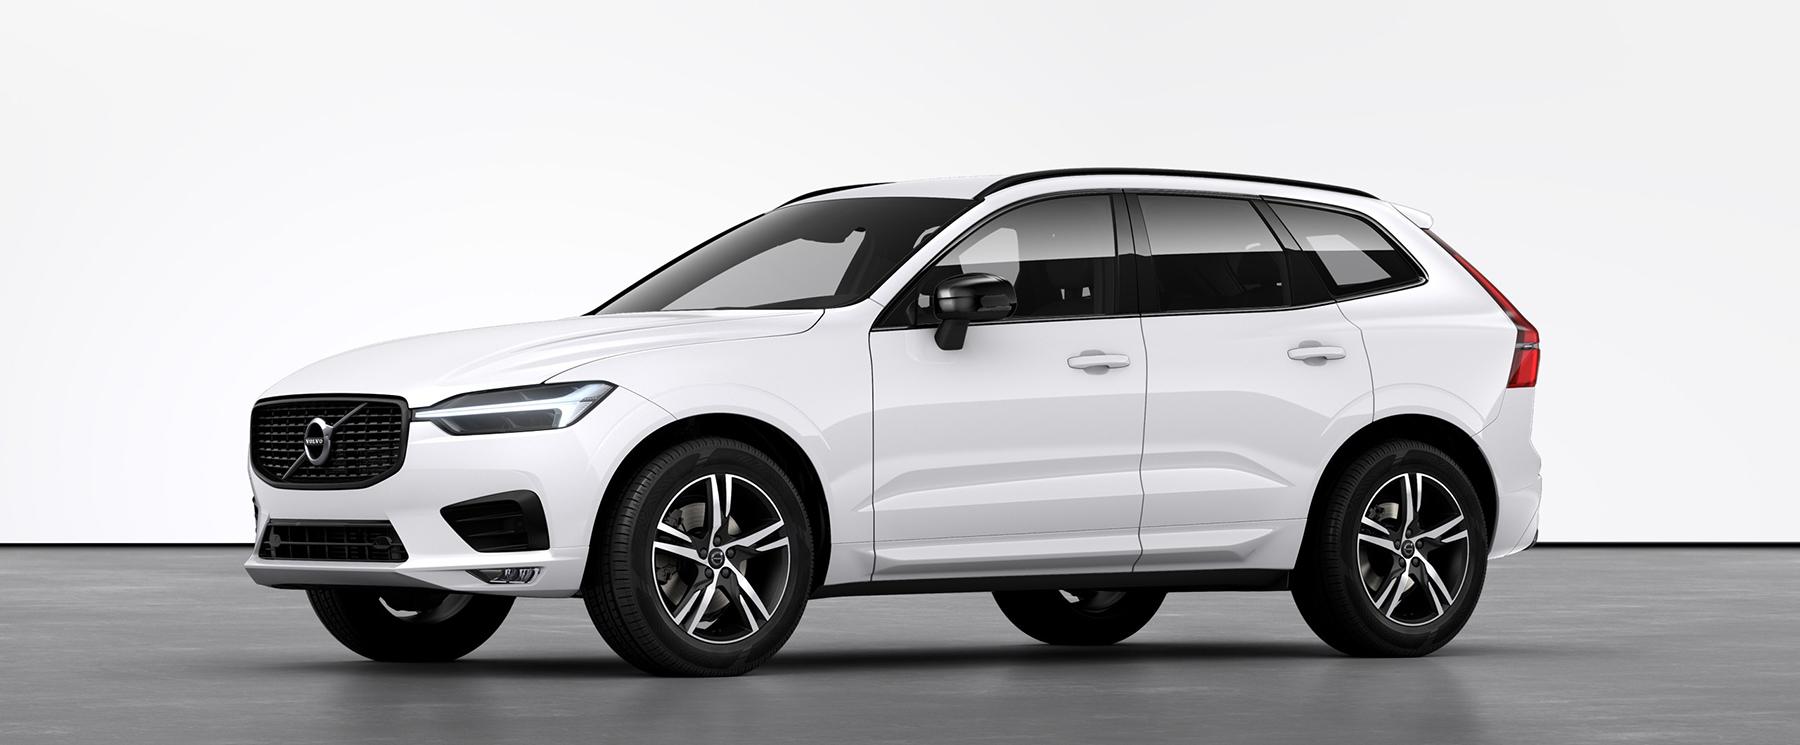 Volvo XC60 Momentum Advantage